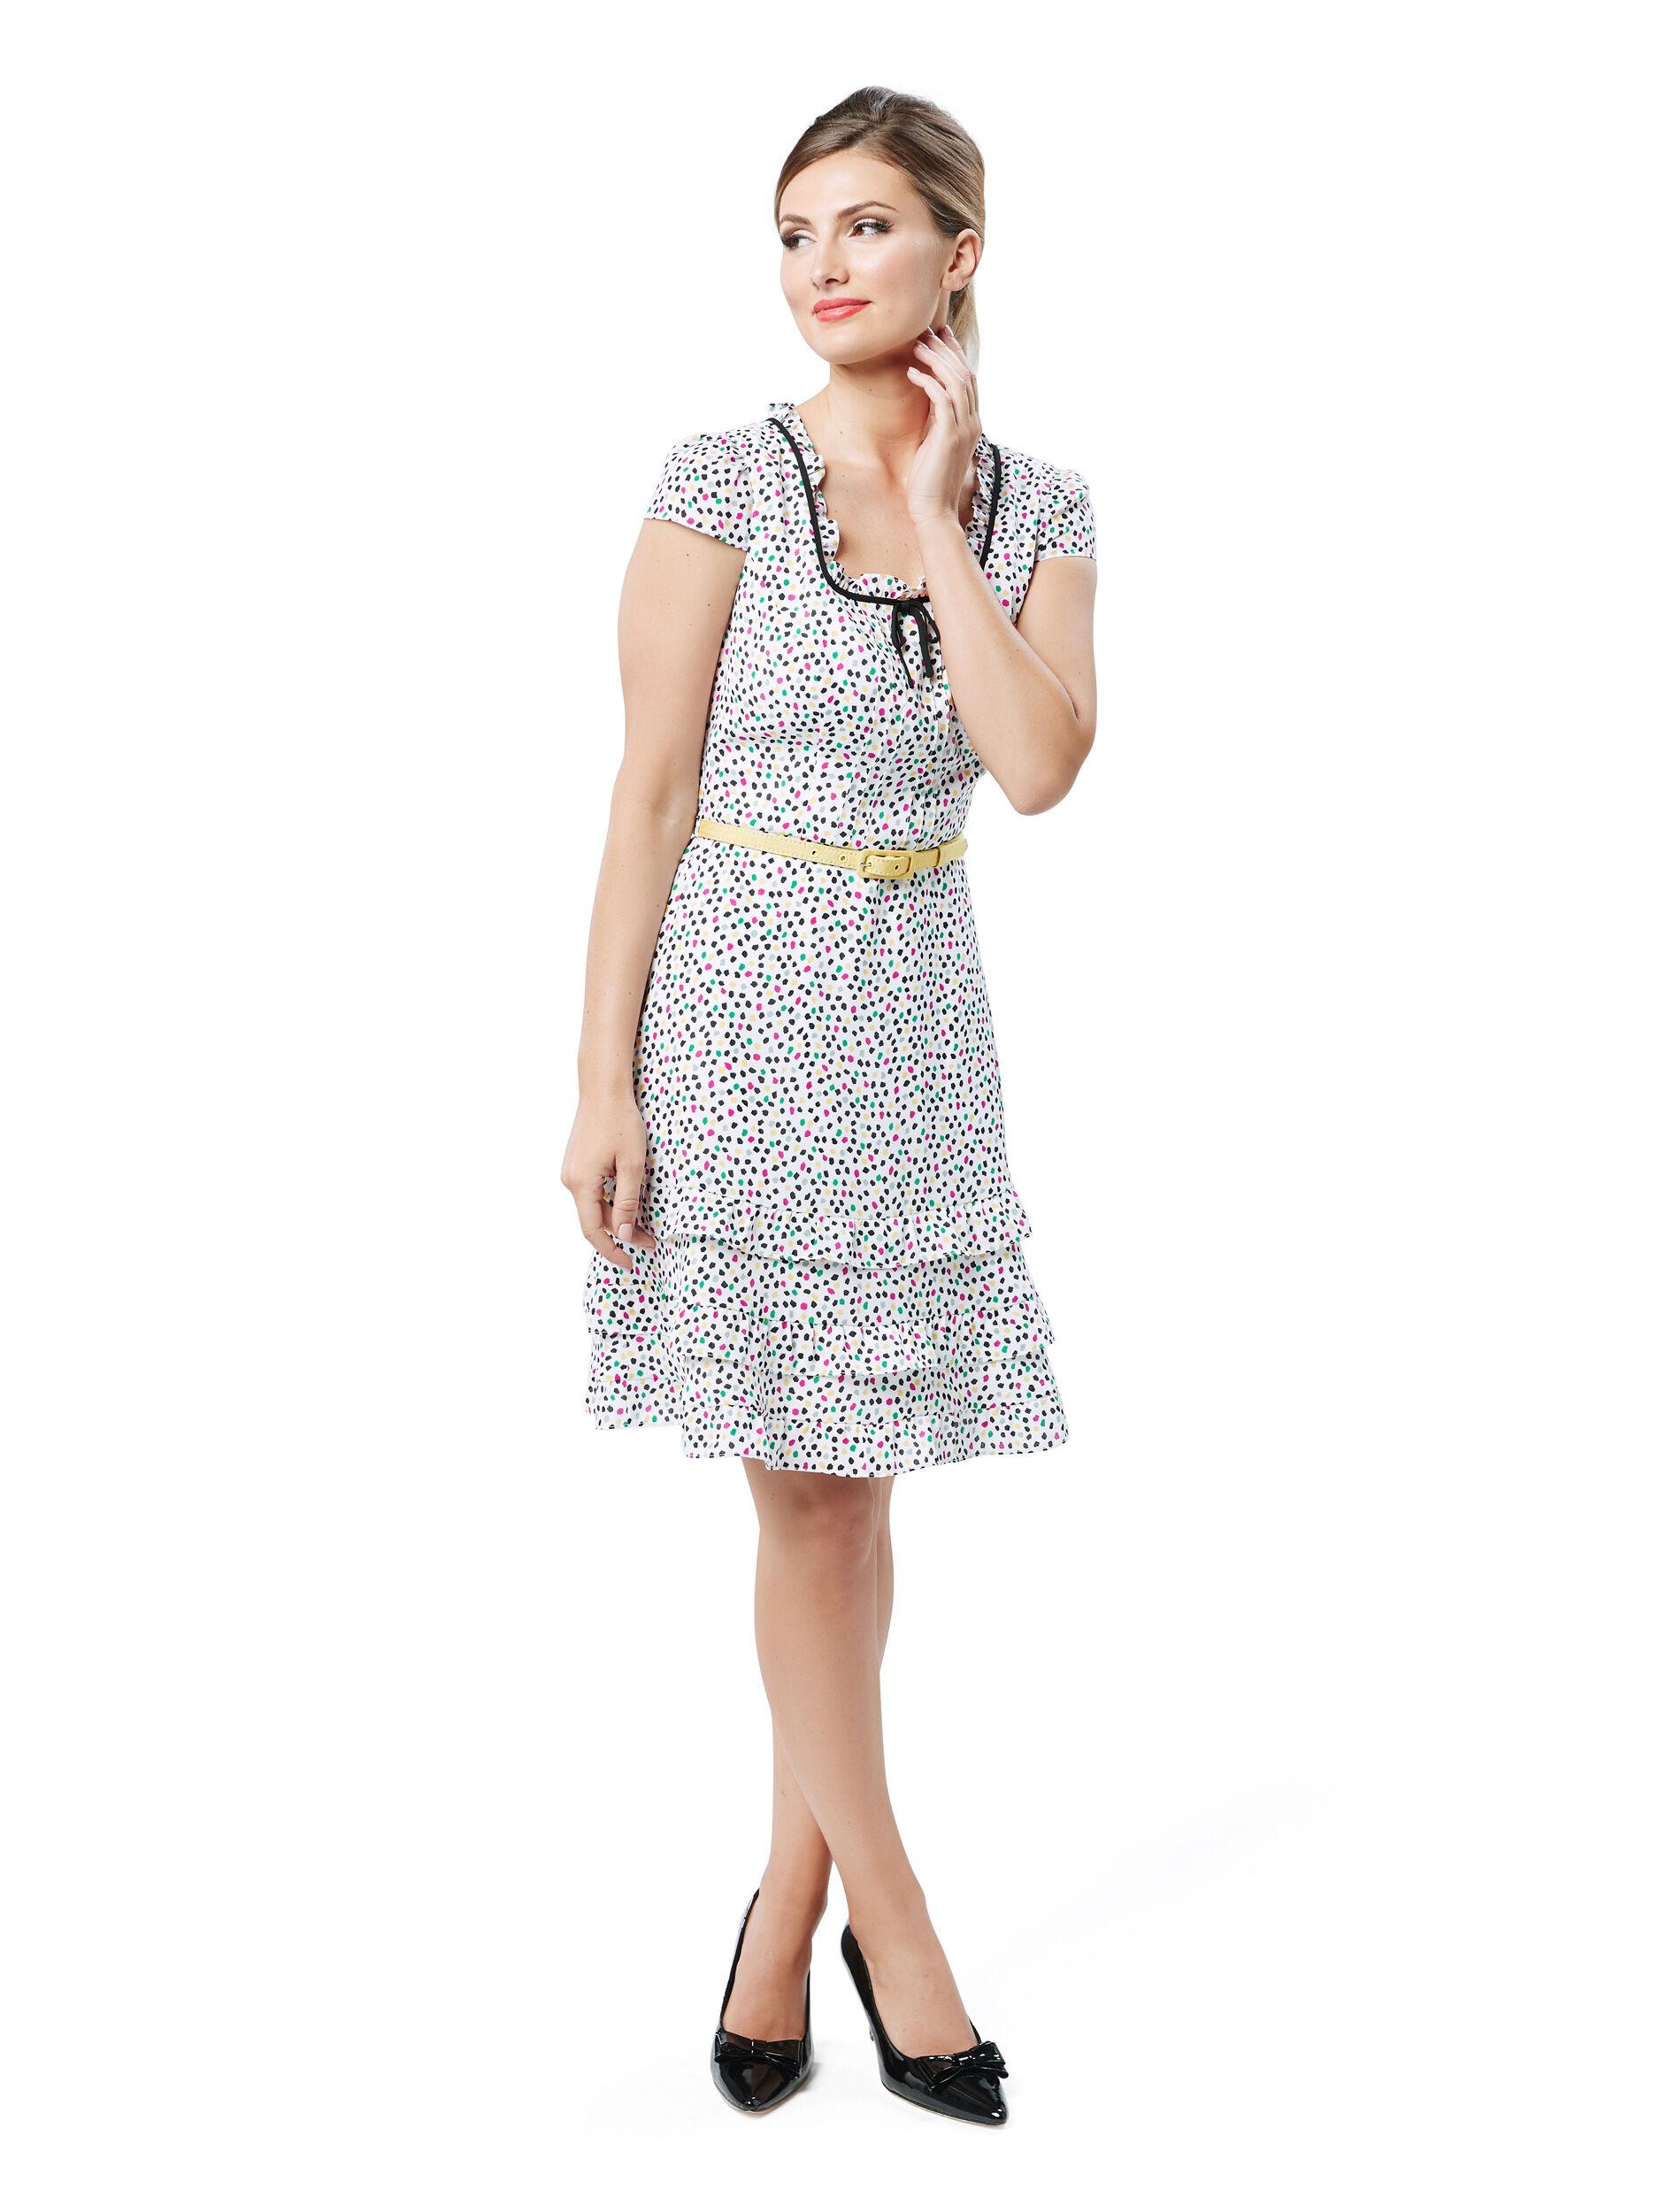 Sprinkle Spot Dress